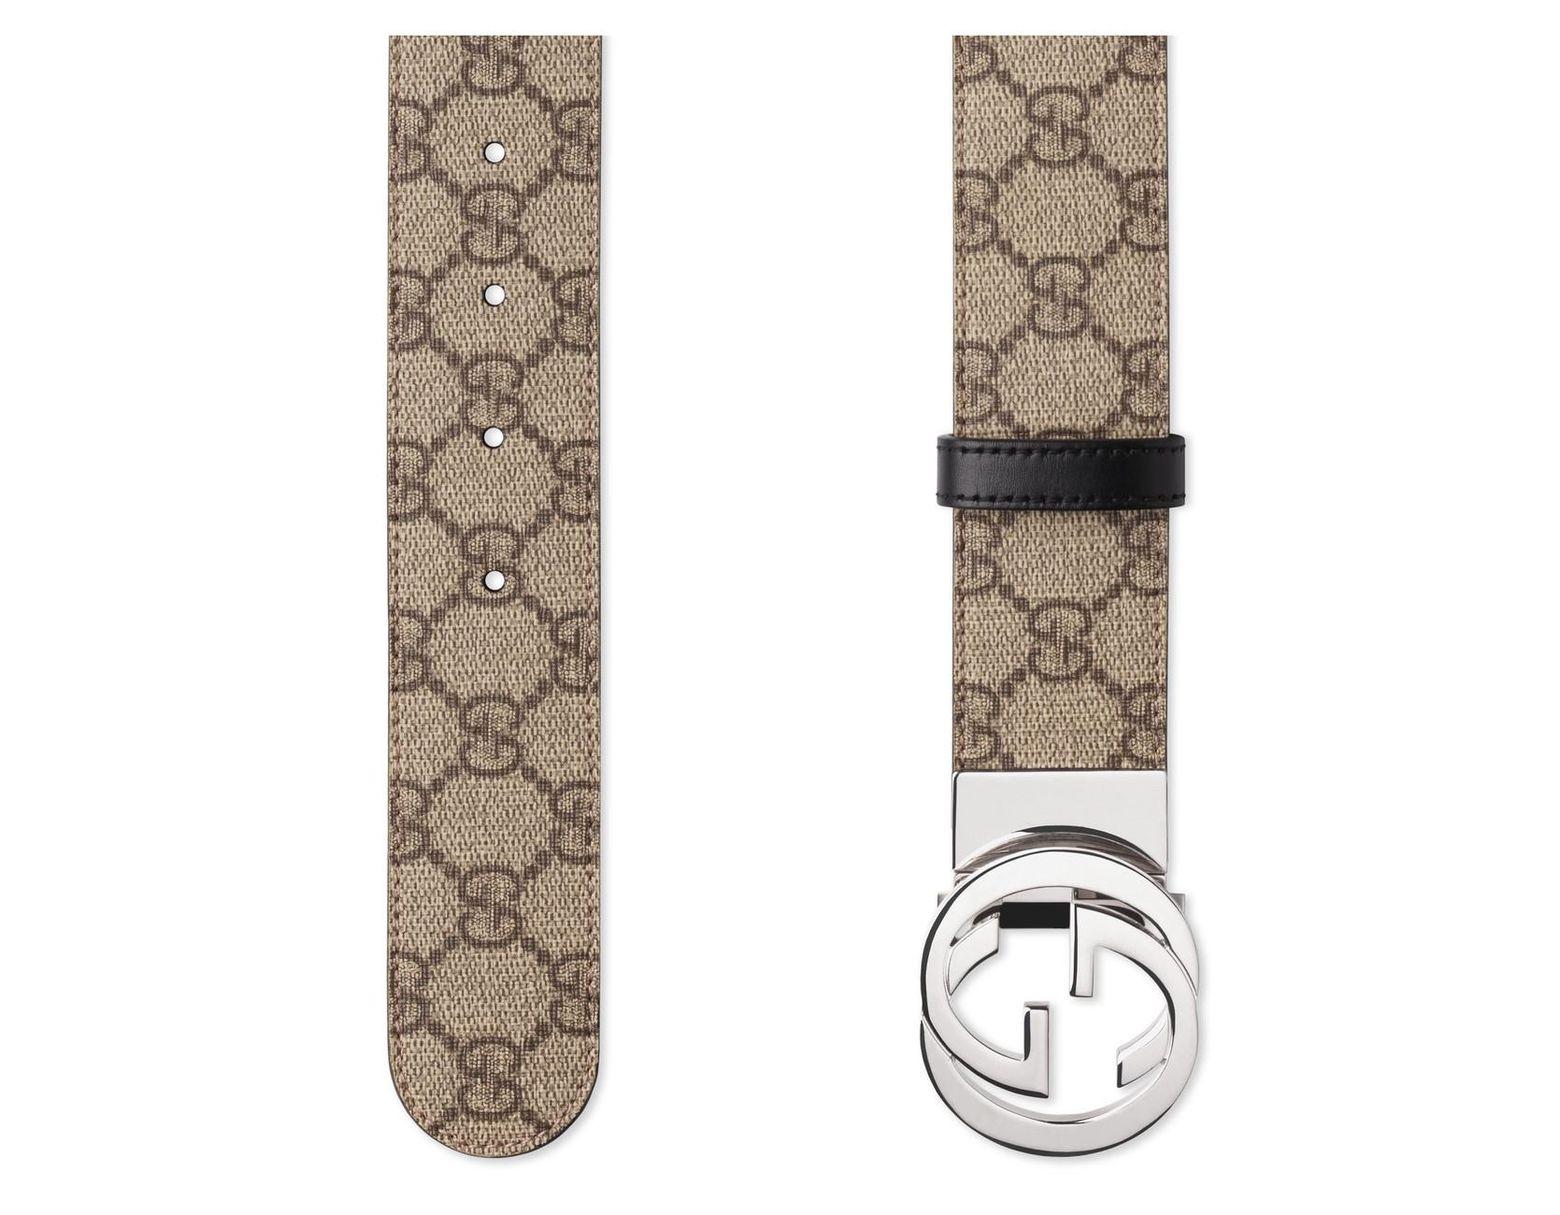 3b61e6ba007 Lyst - Gucci Reversible GG Supreme Belt in Black for Men